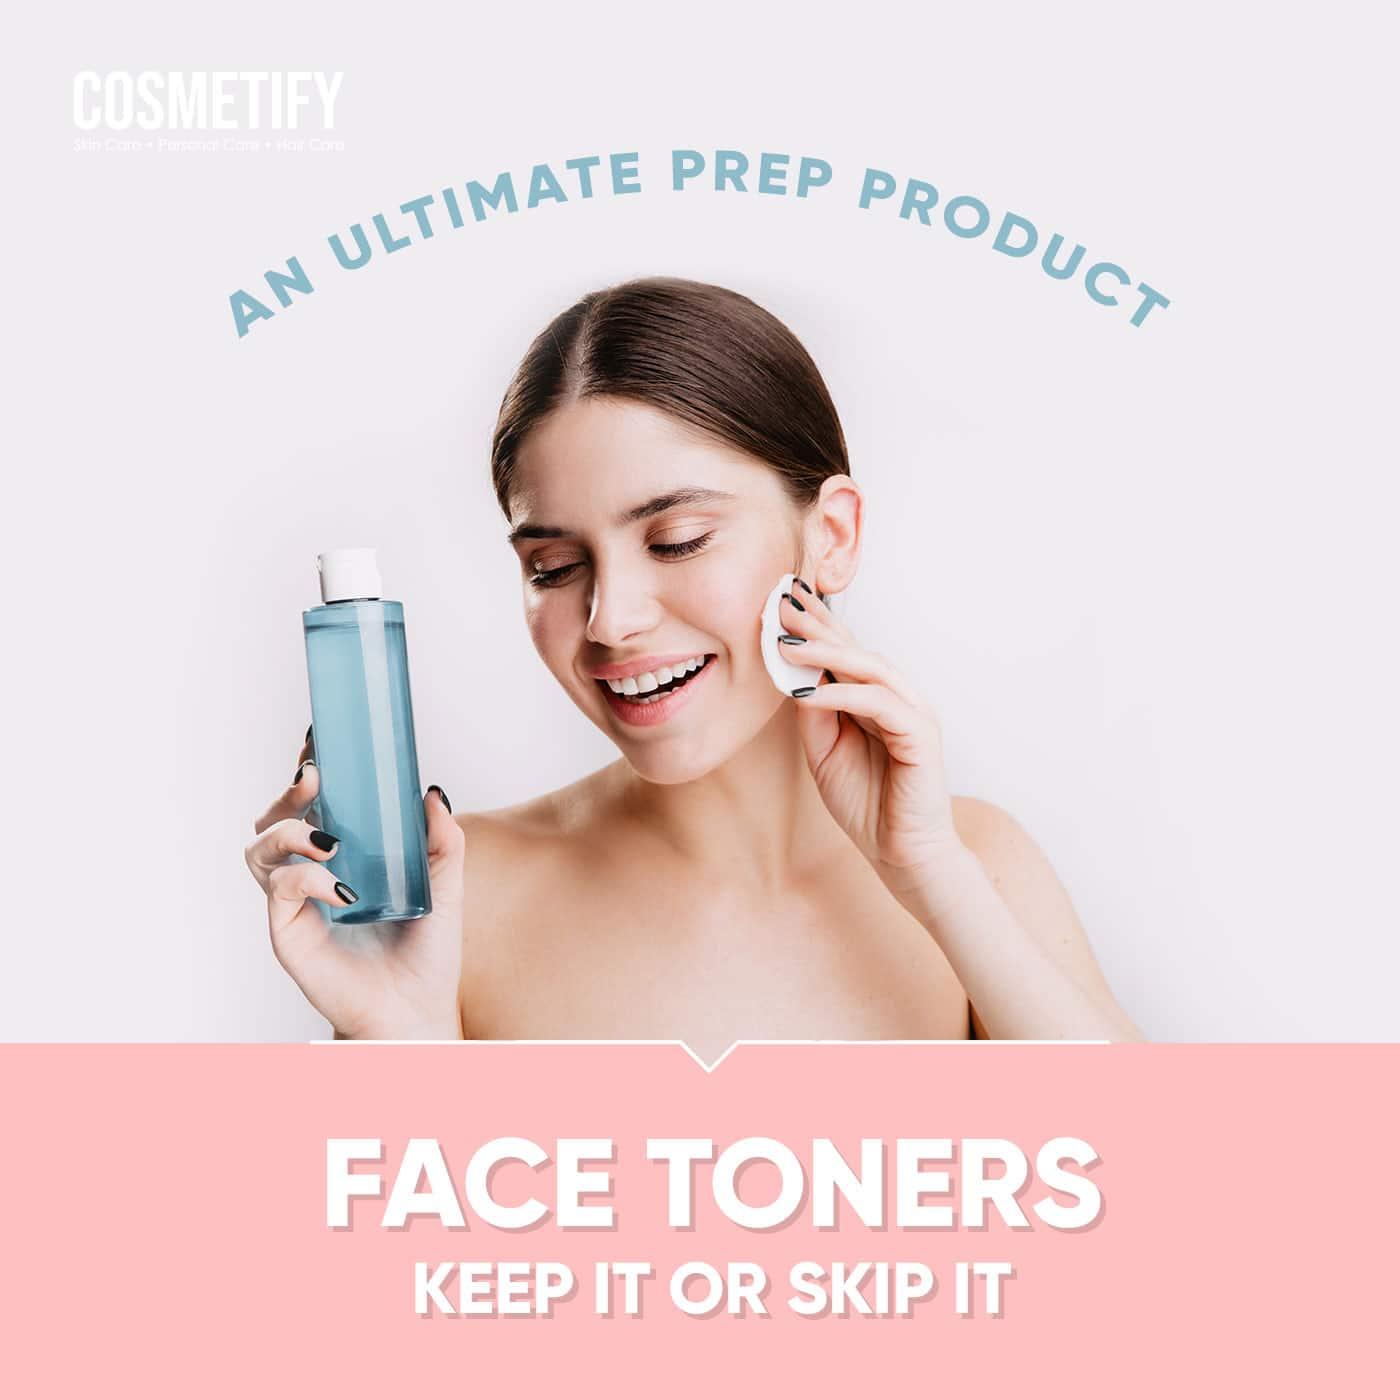 face toner benefits